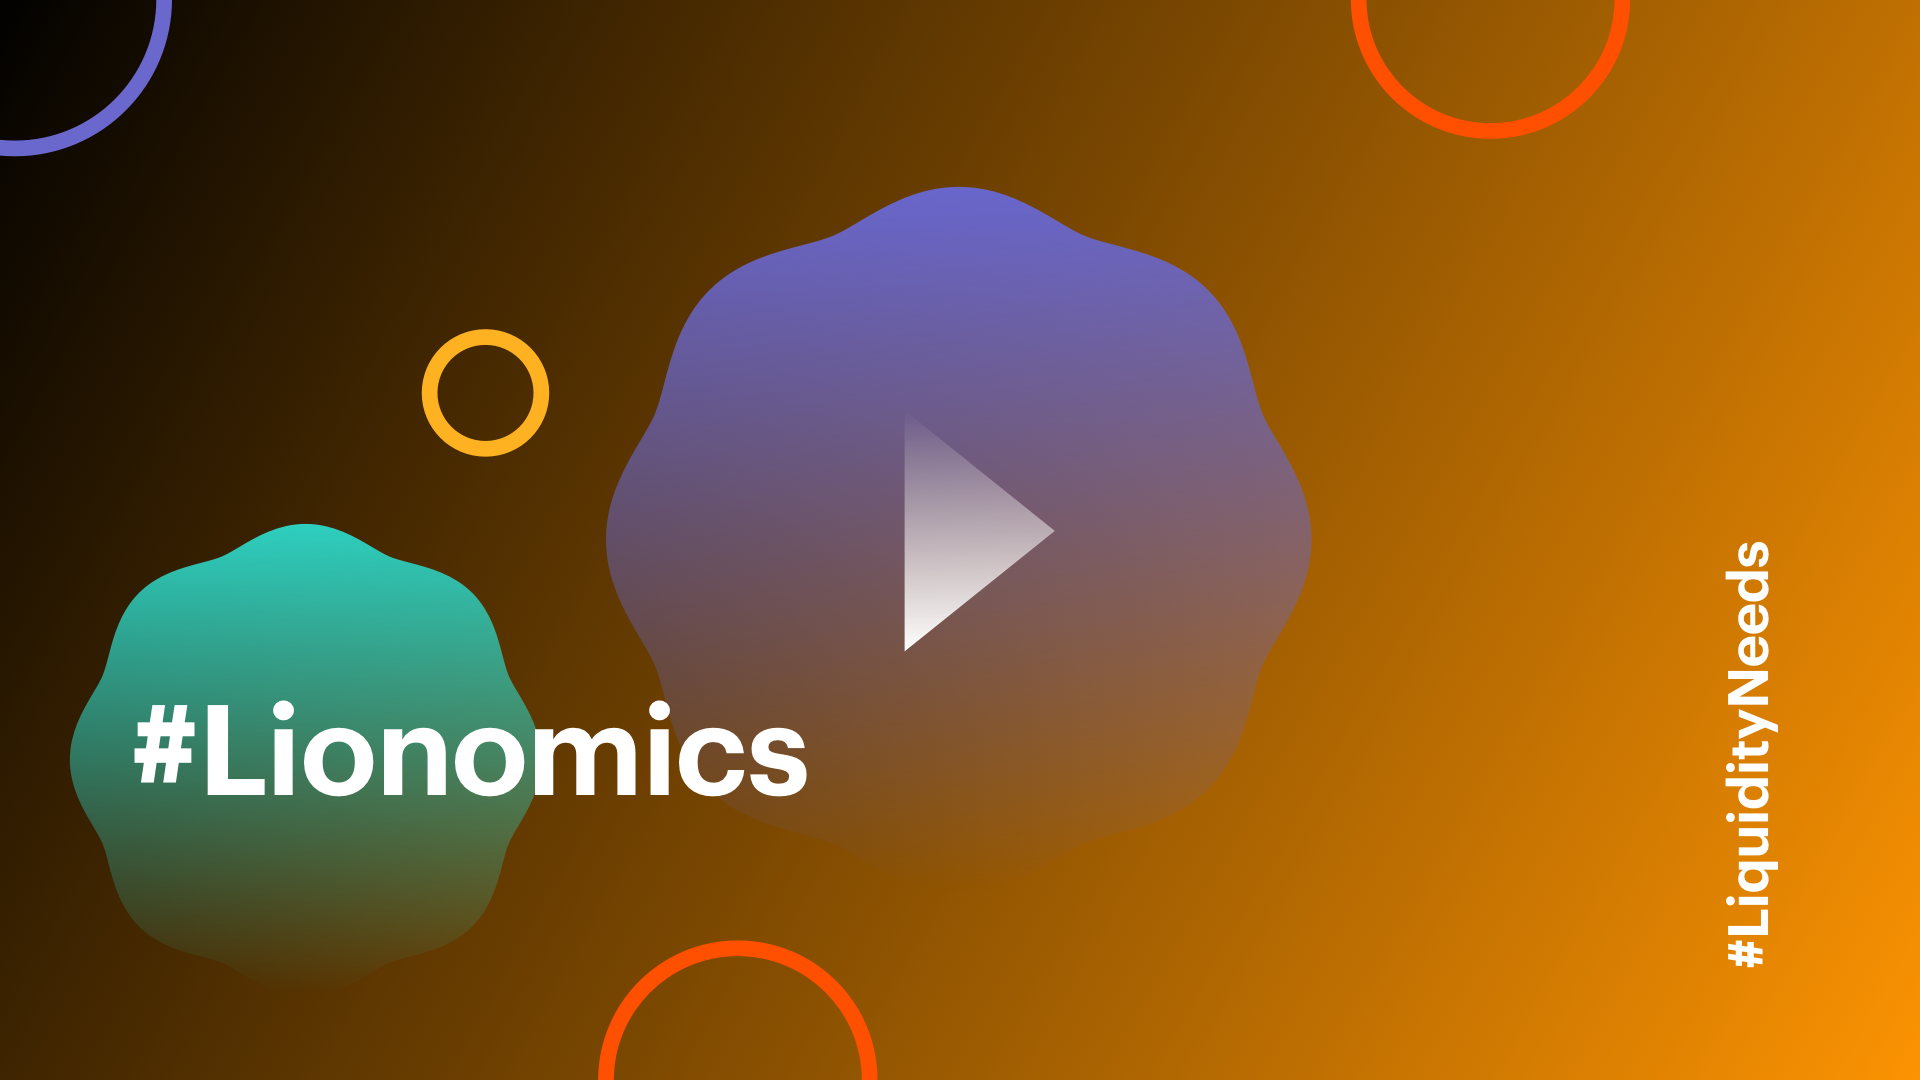 Lionomics1 Blog Liquidity needs 08152018